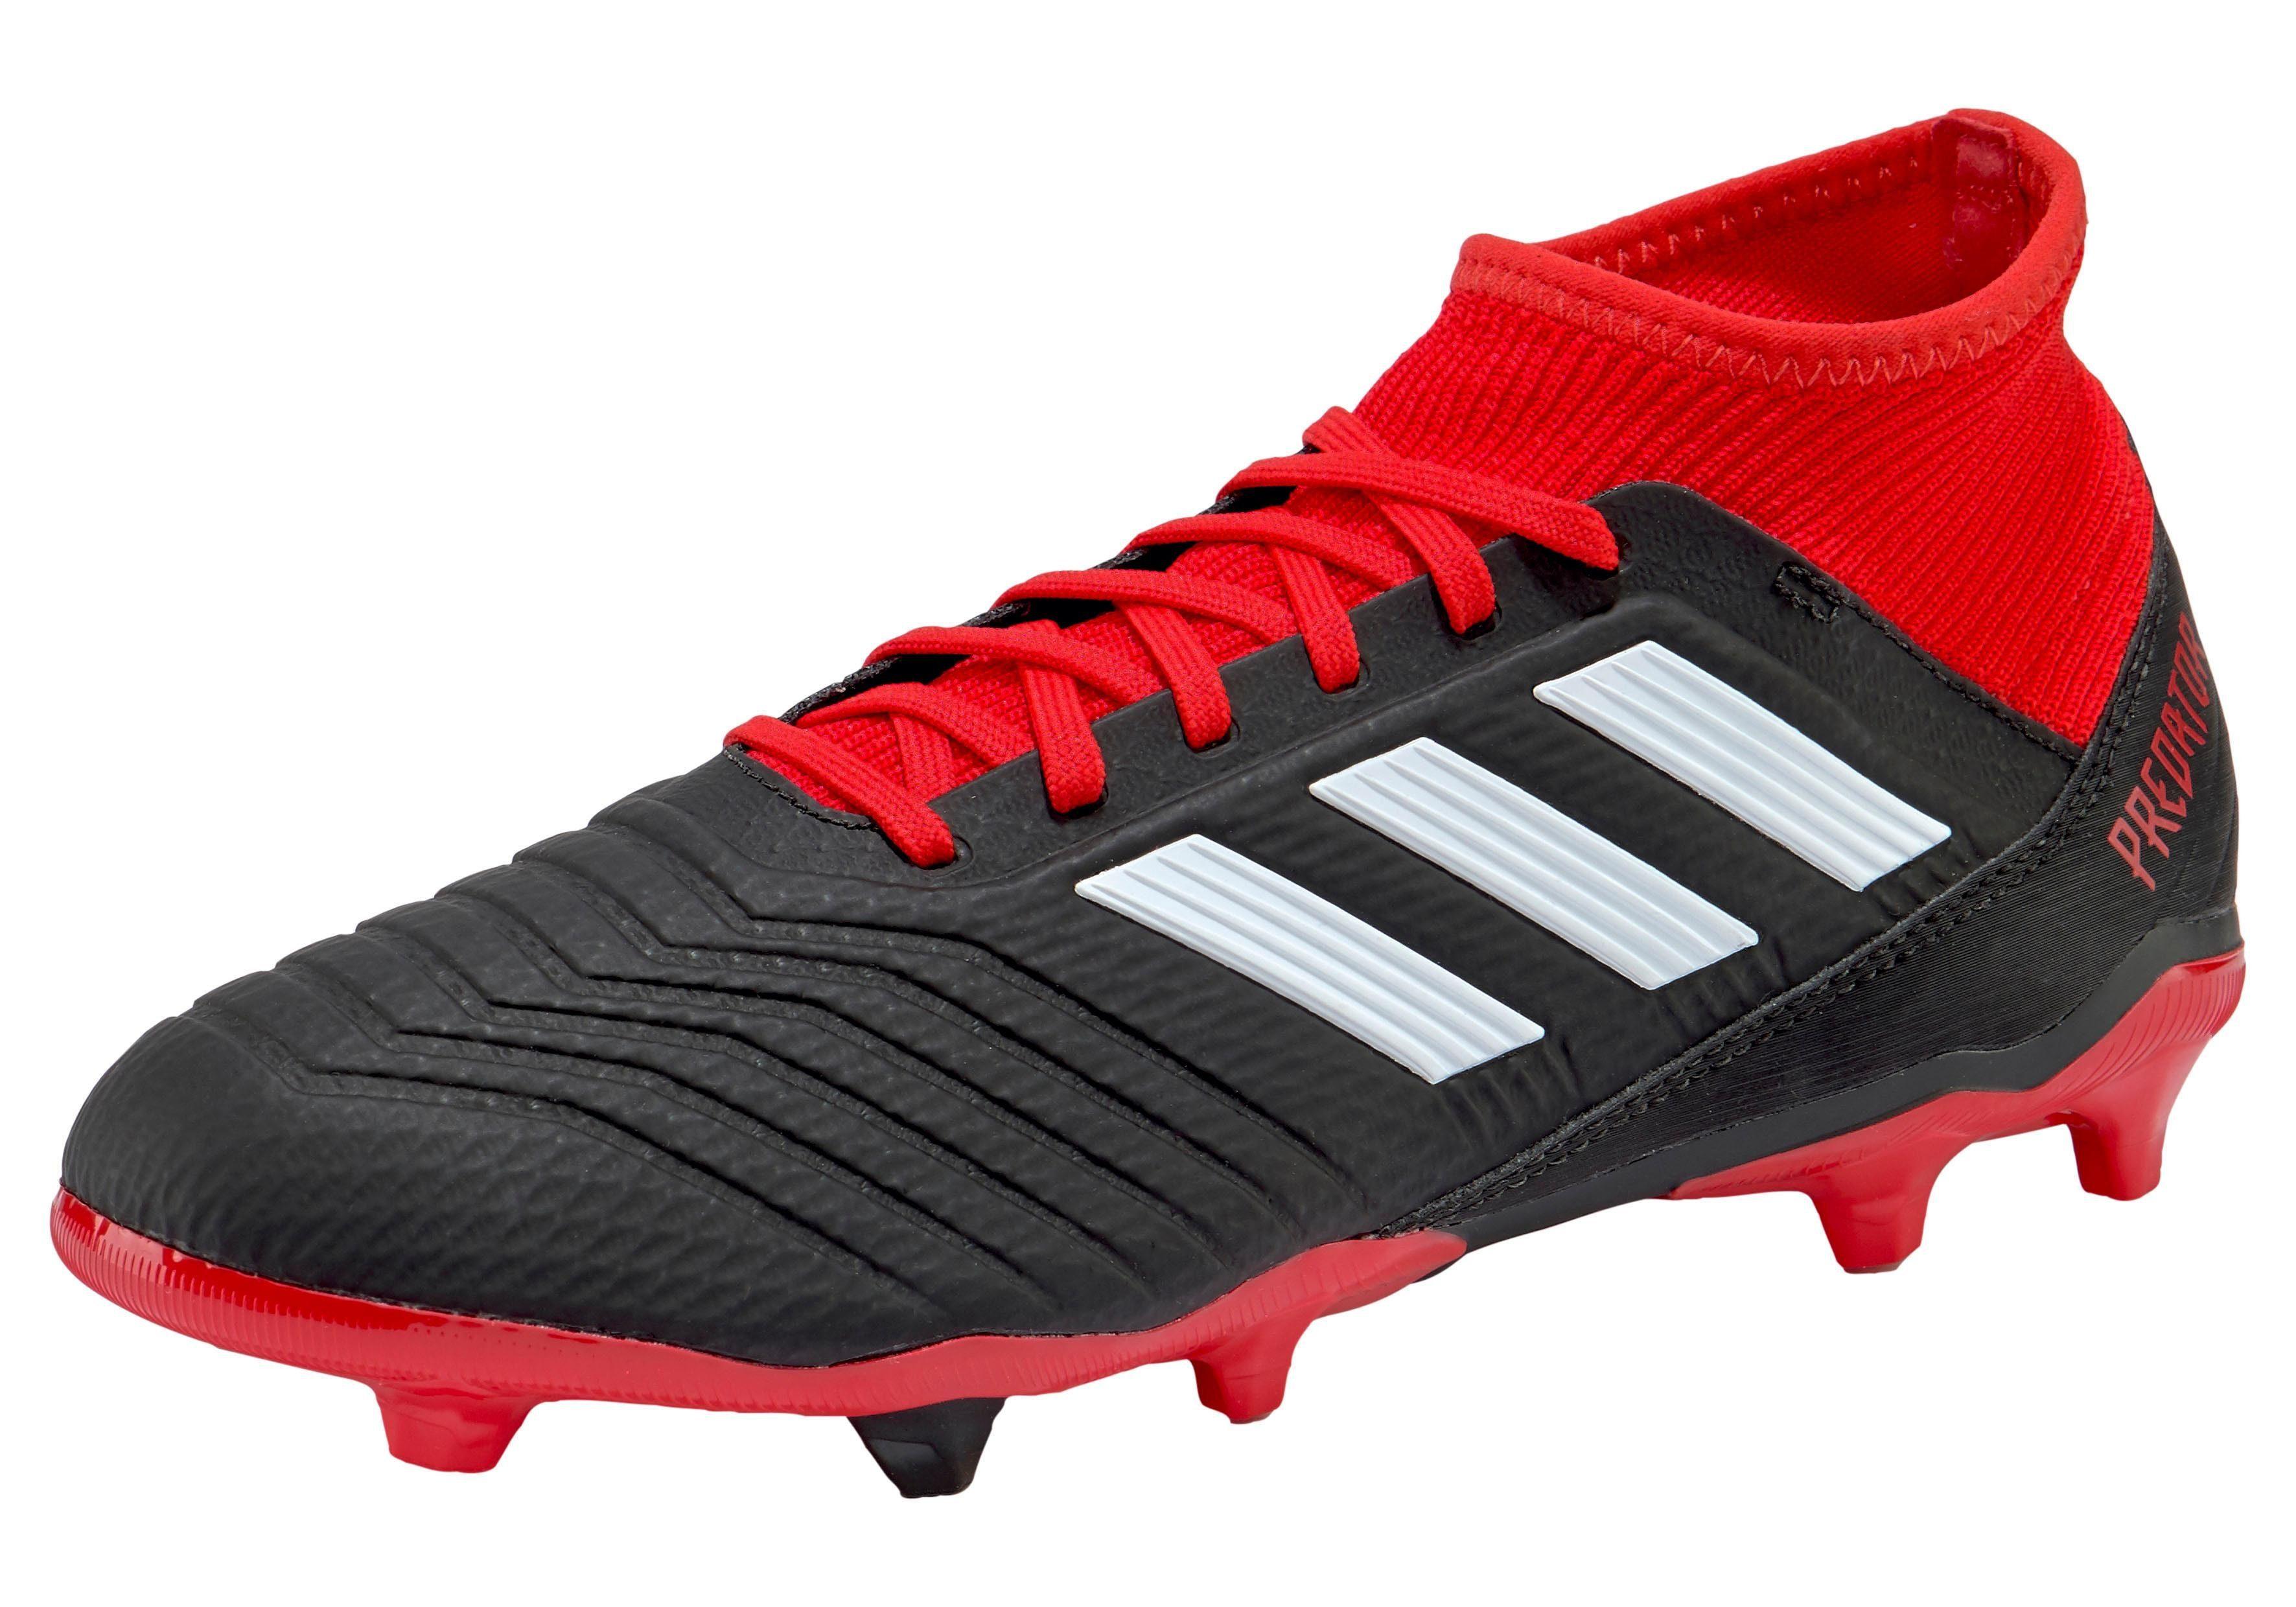 oude modellen adidas voetbalschoenen